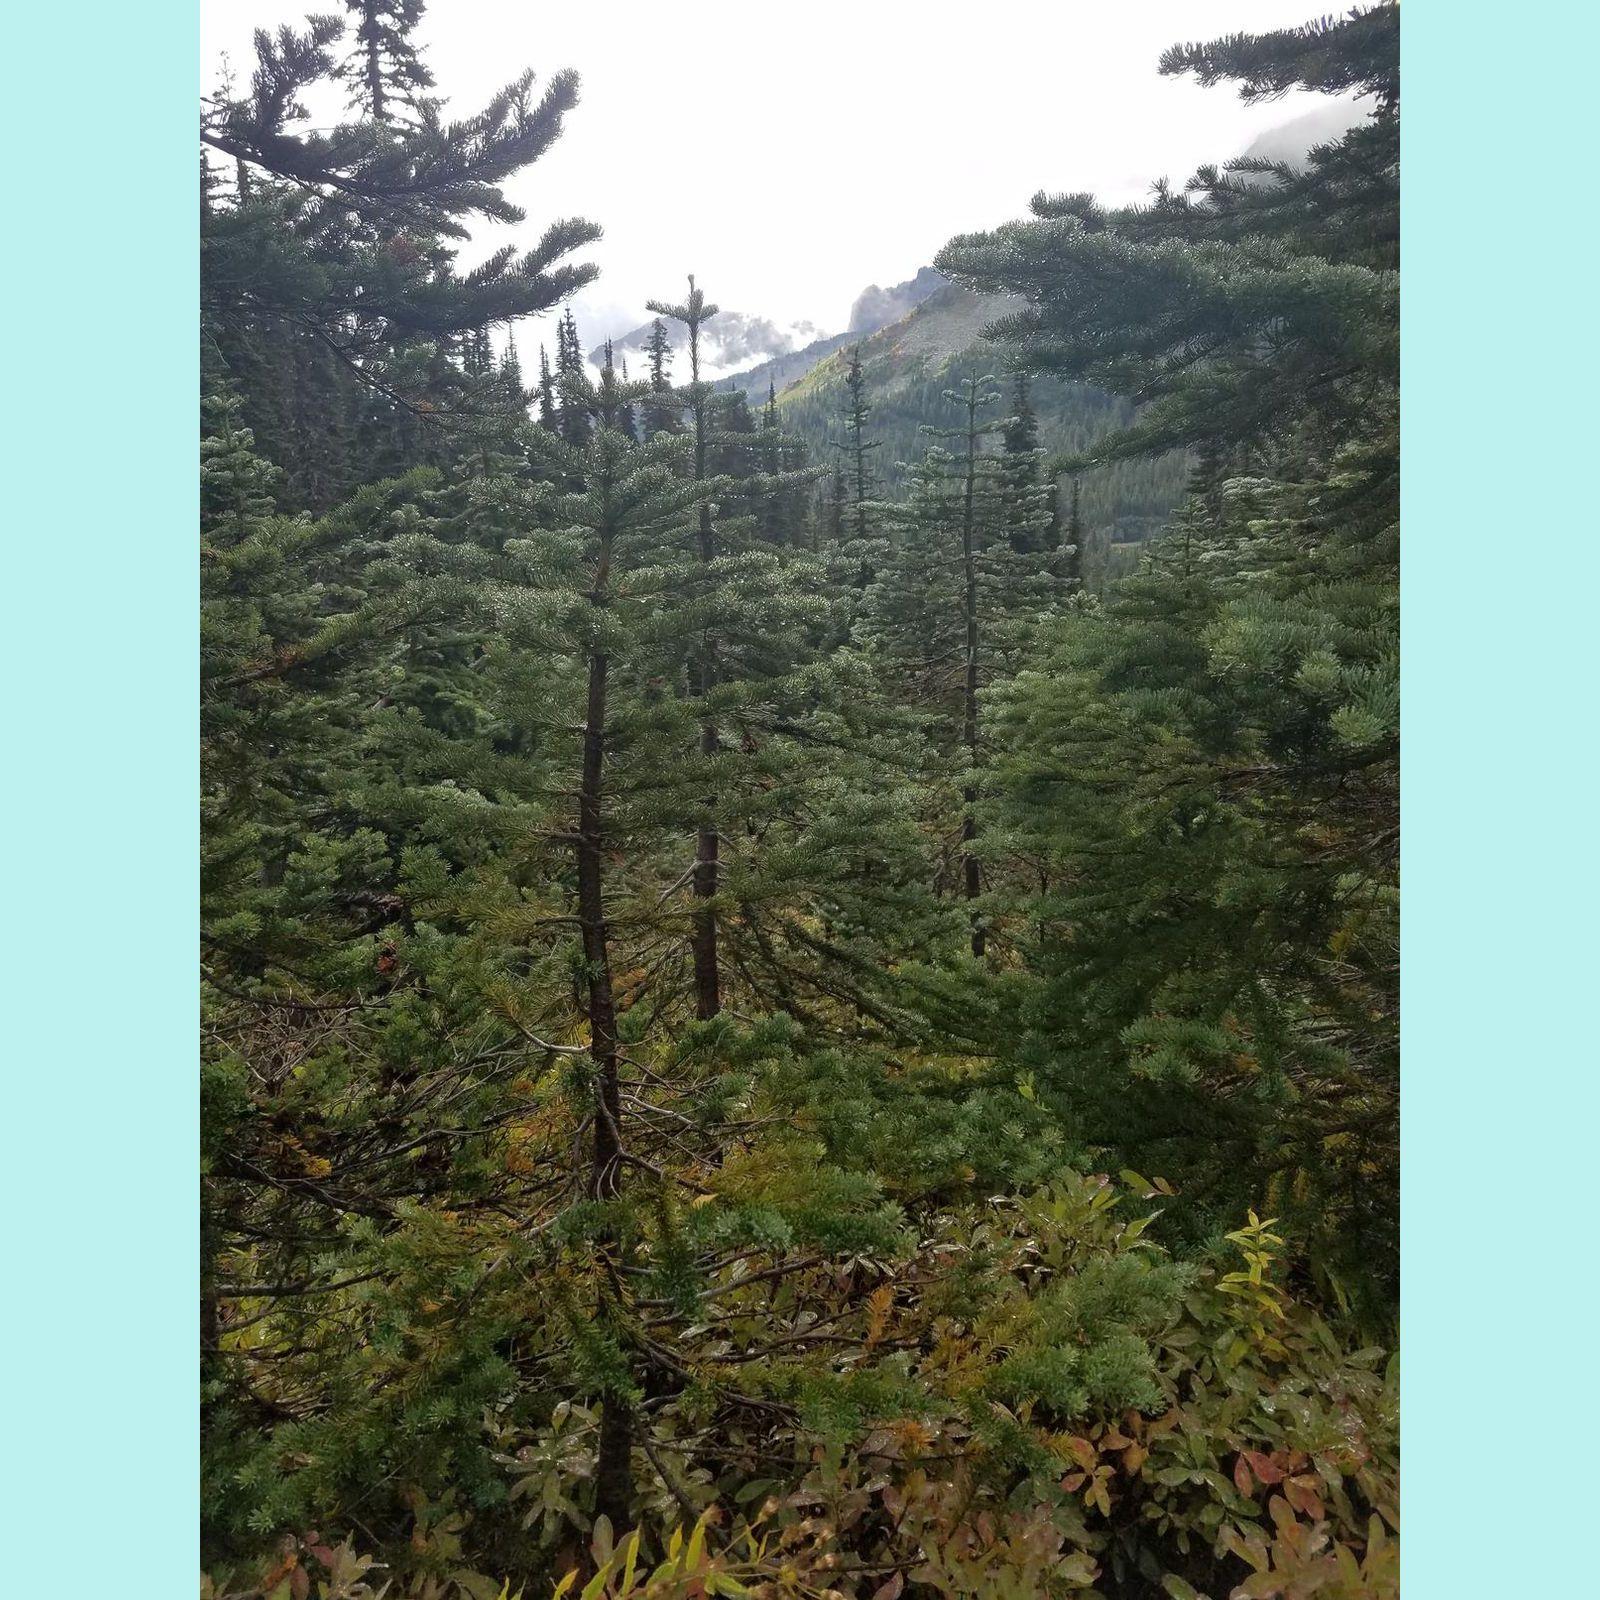 Rain sparkled evergreens